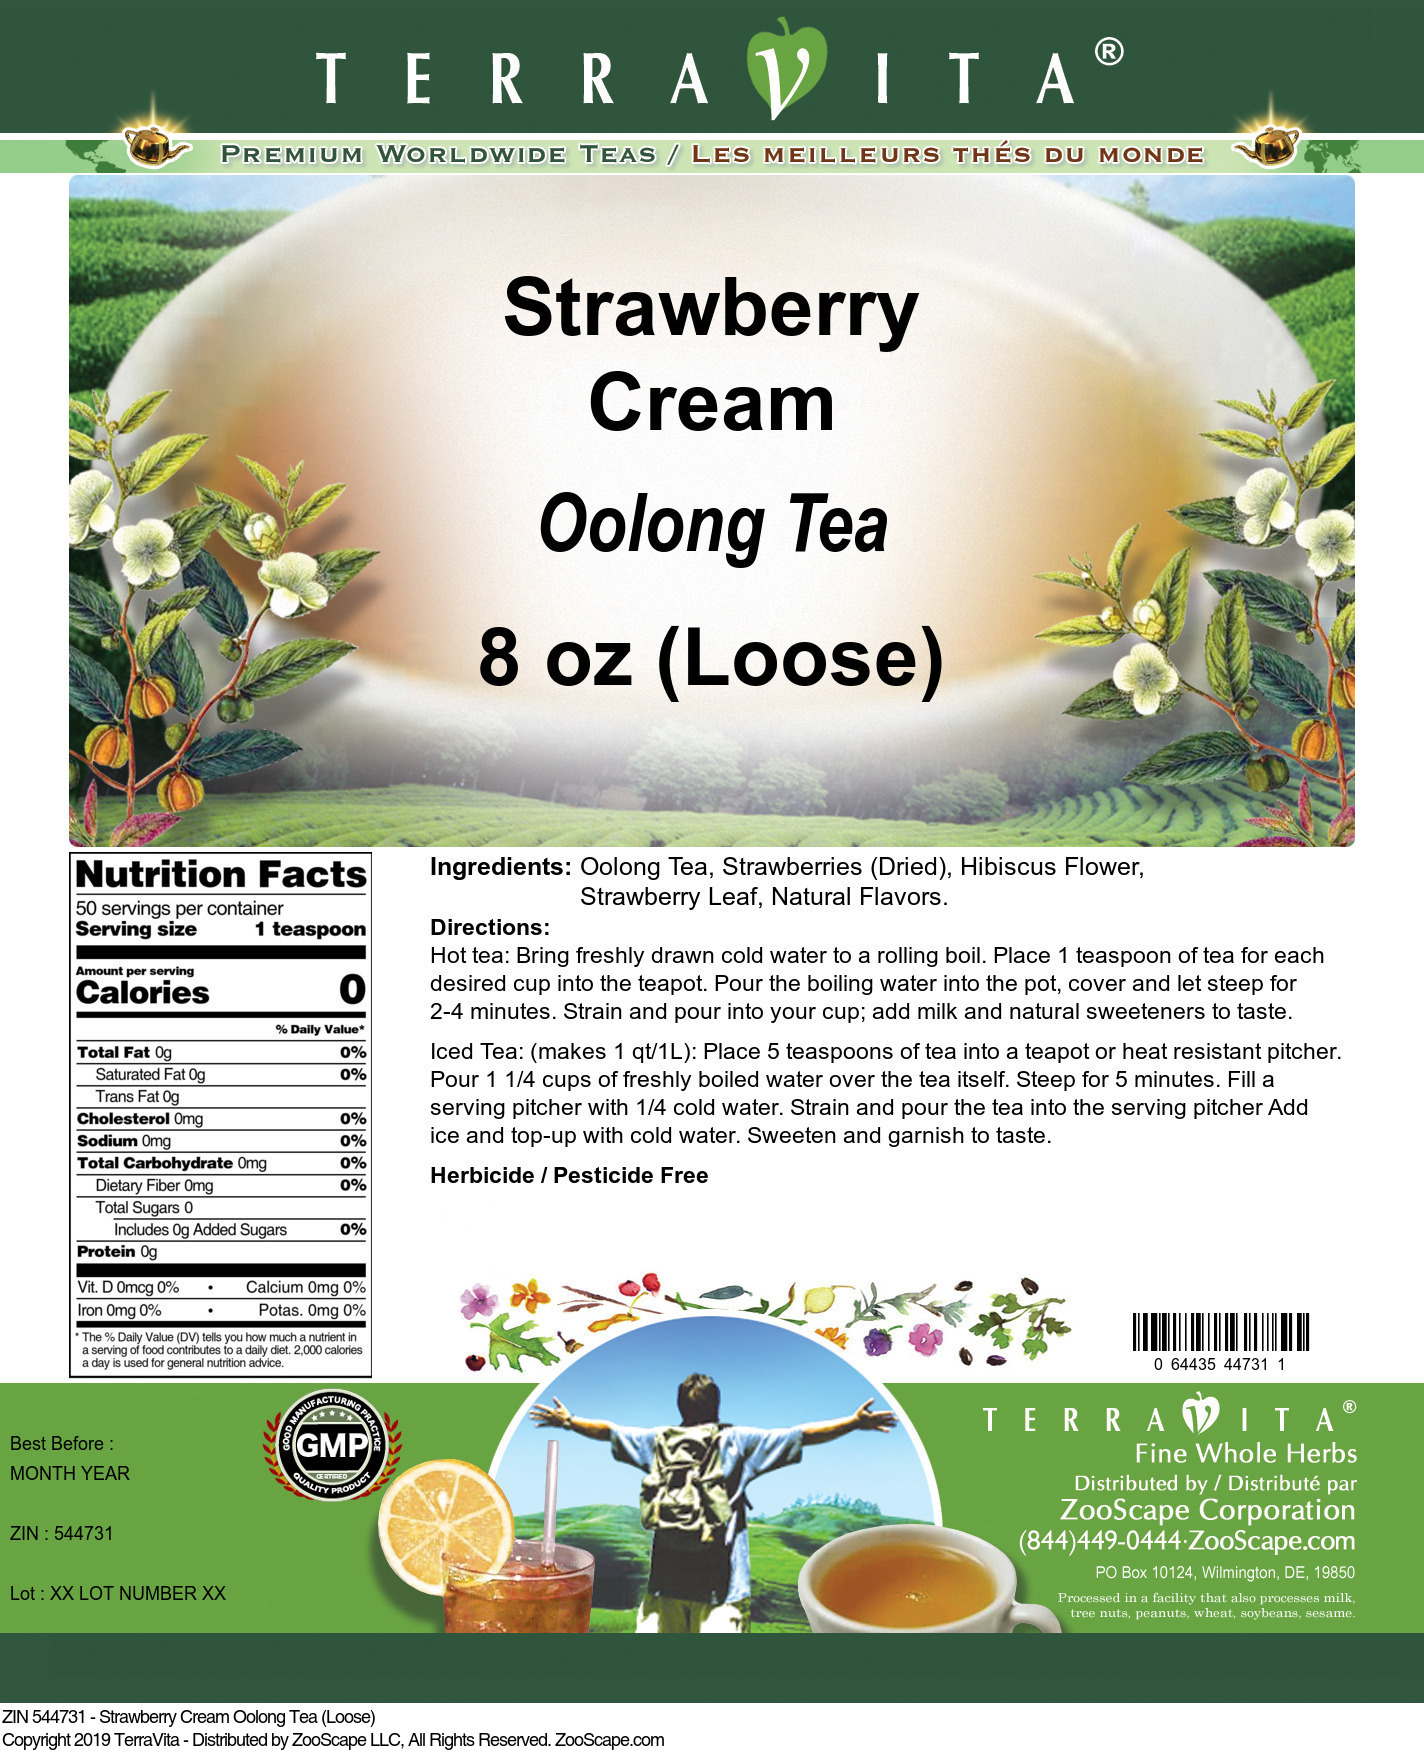 Strawberry Cream Oolong Tea